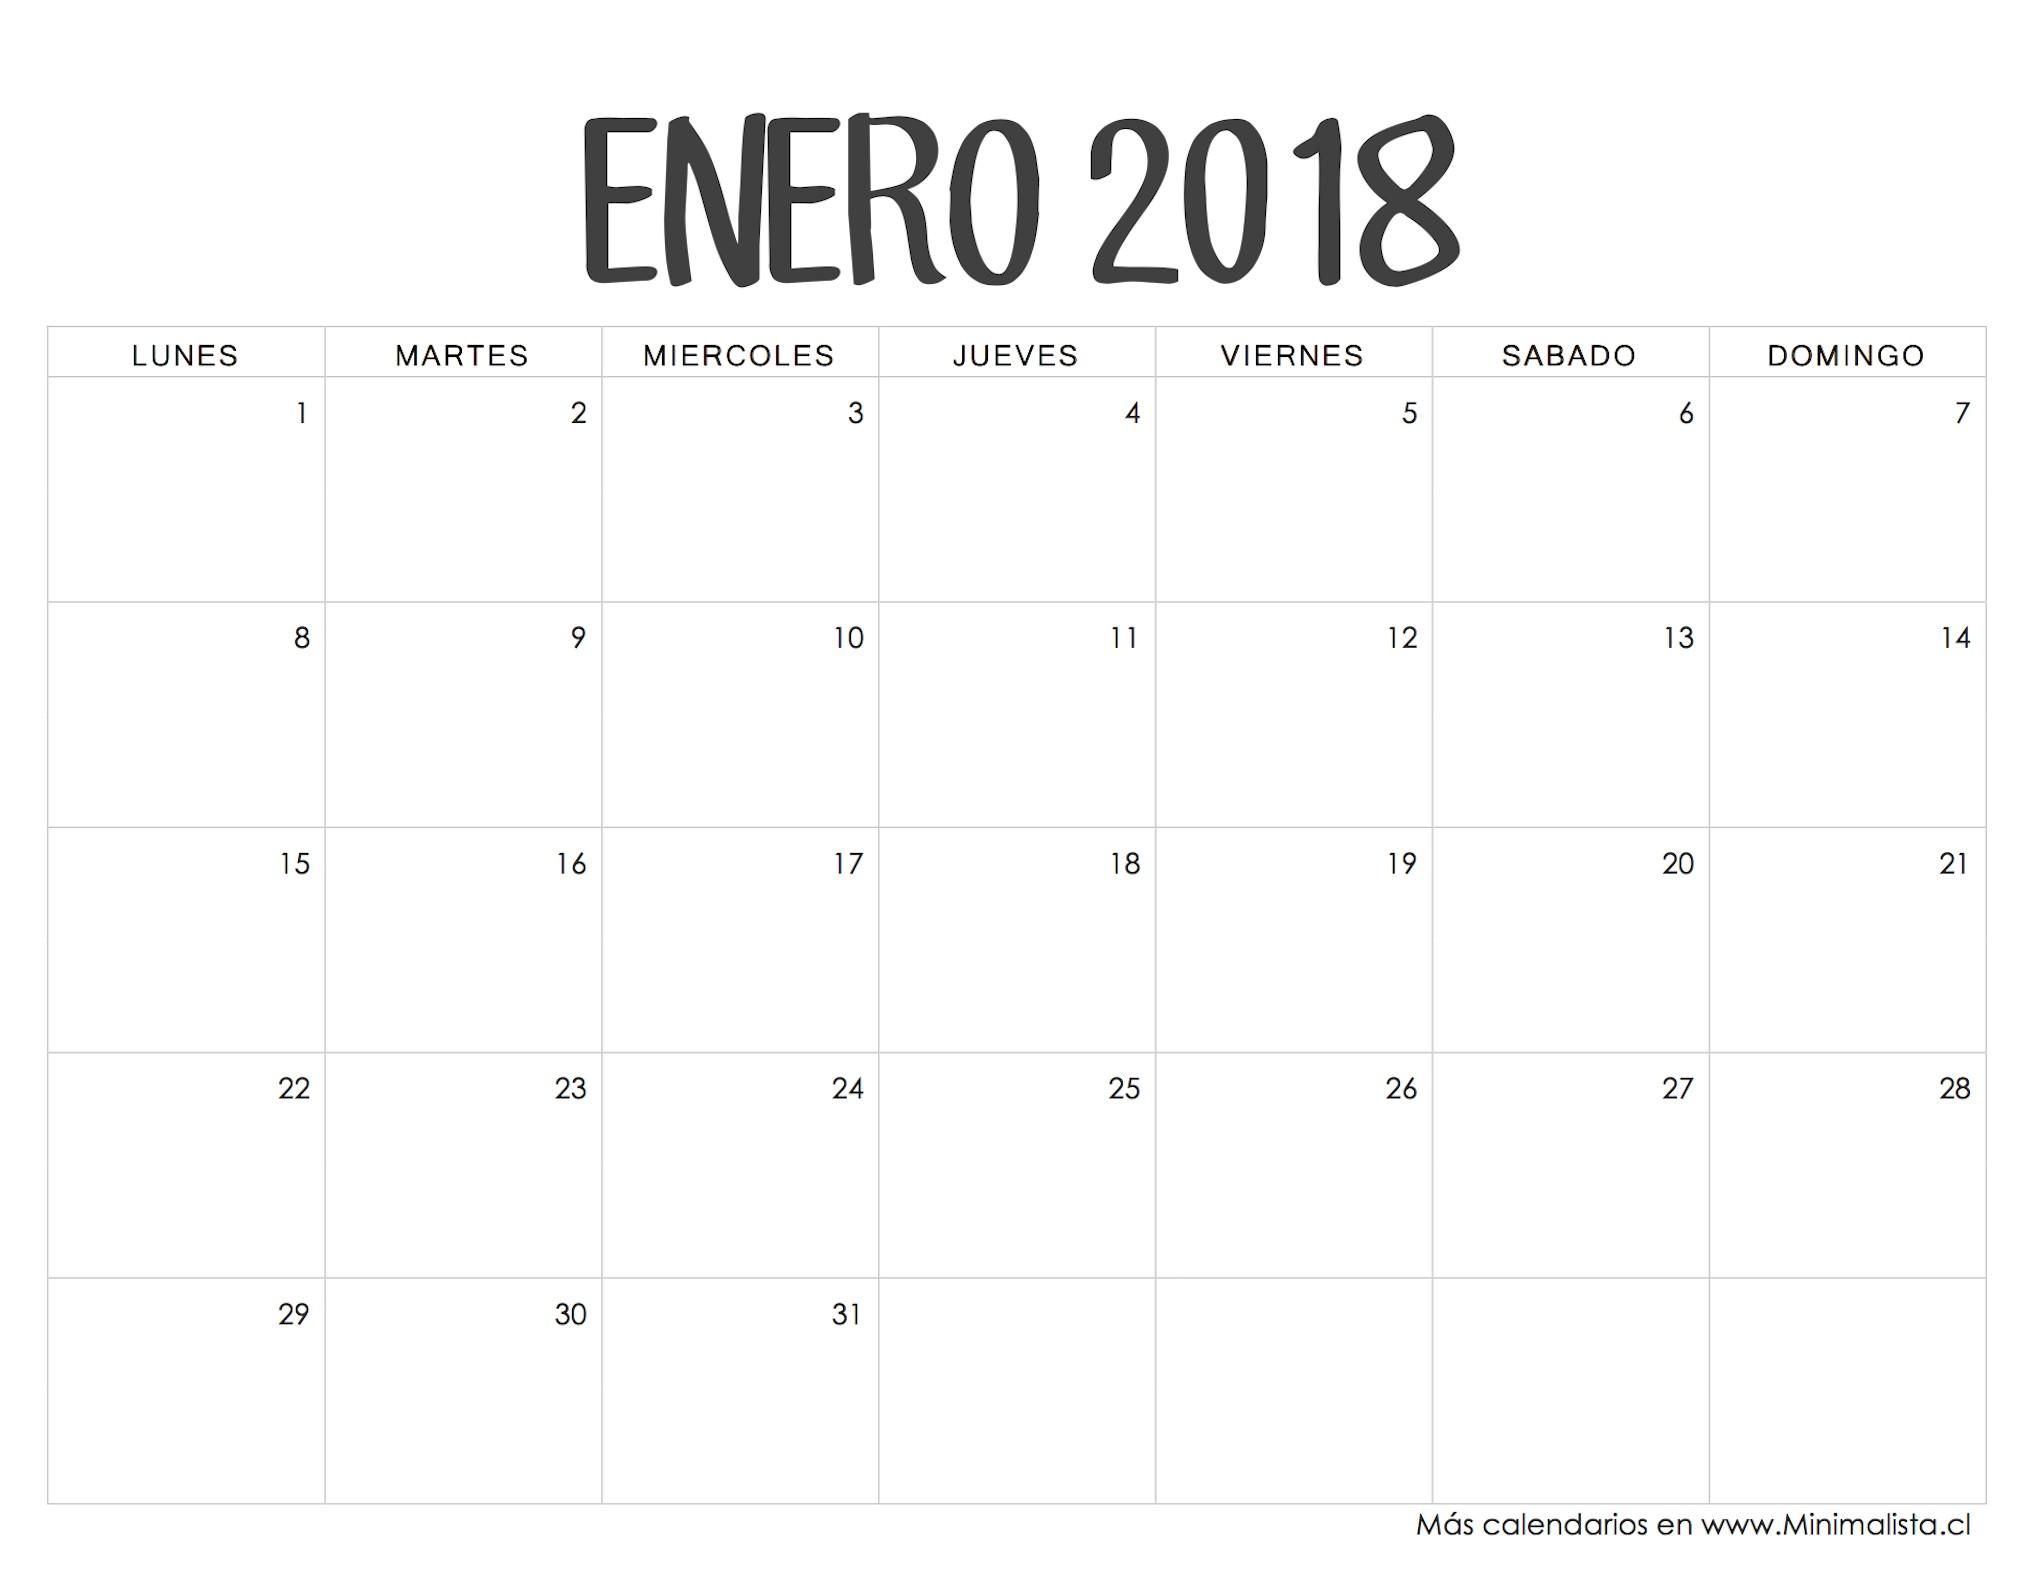 Calendario 2019 Para Imprimir Mes A Mes Más Populares Calendarios 2018 Para Imprimir – Minimalista Rutinas Of Calendario 2019 Para Imprimir Mes A Mes Más Populares Calendário 2019